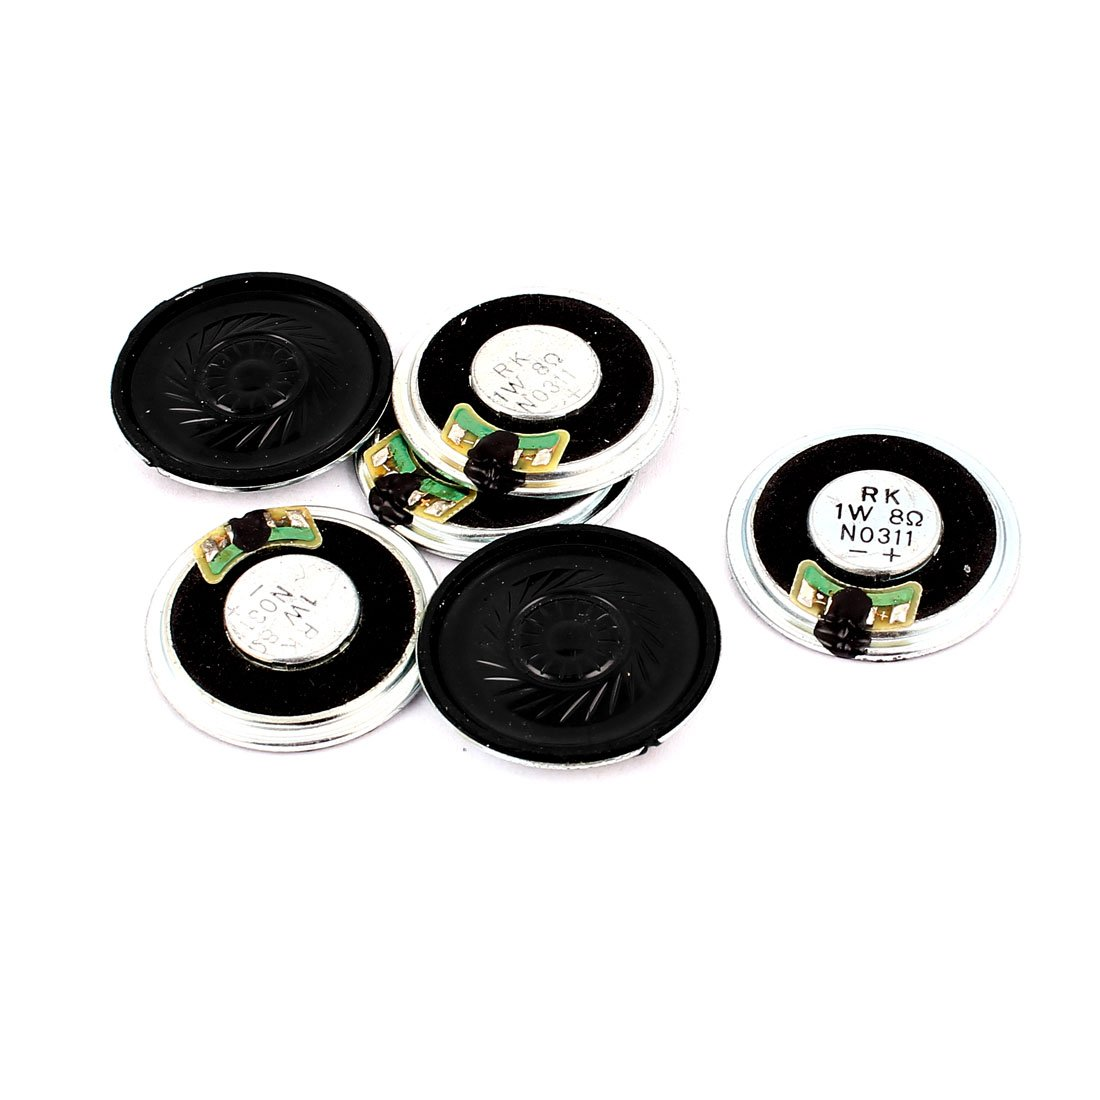 uxcell 1W 36mm Diameter 8 Ohm Internal Mini Magnet Speaker Loudspeaker 6Pcs